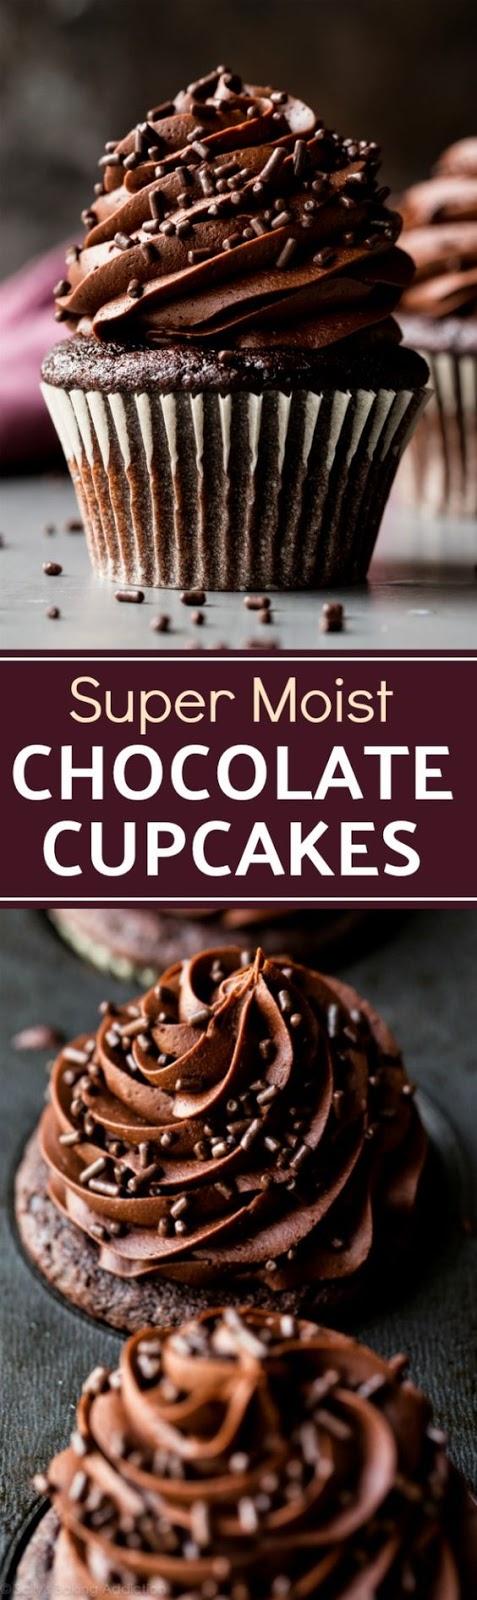 Super Moist Chocolate Cupcakese